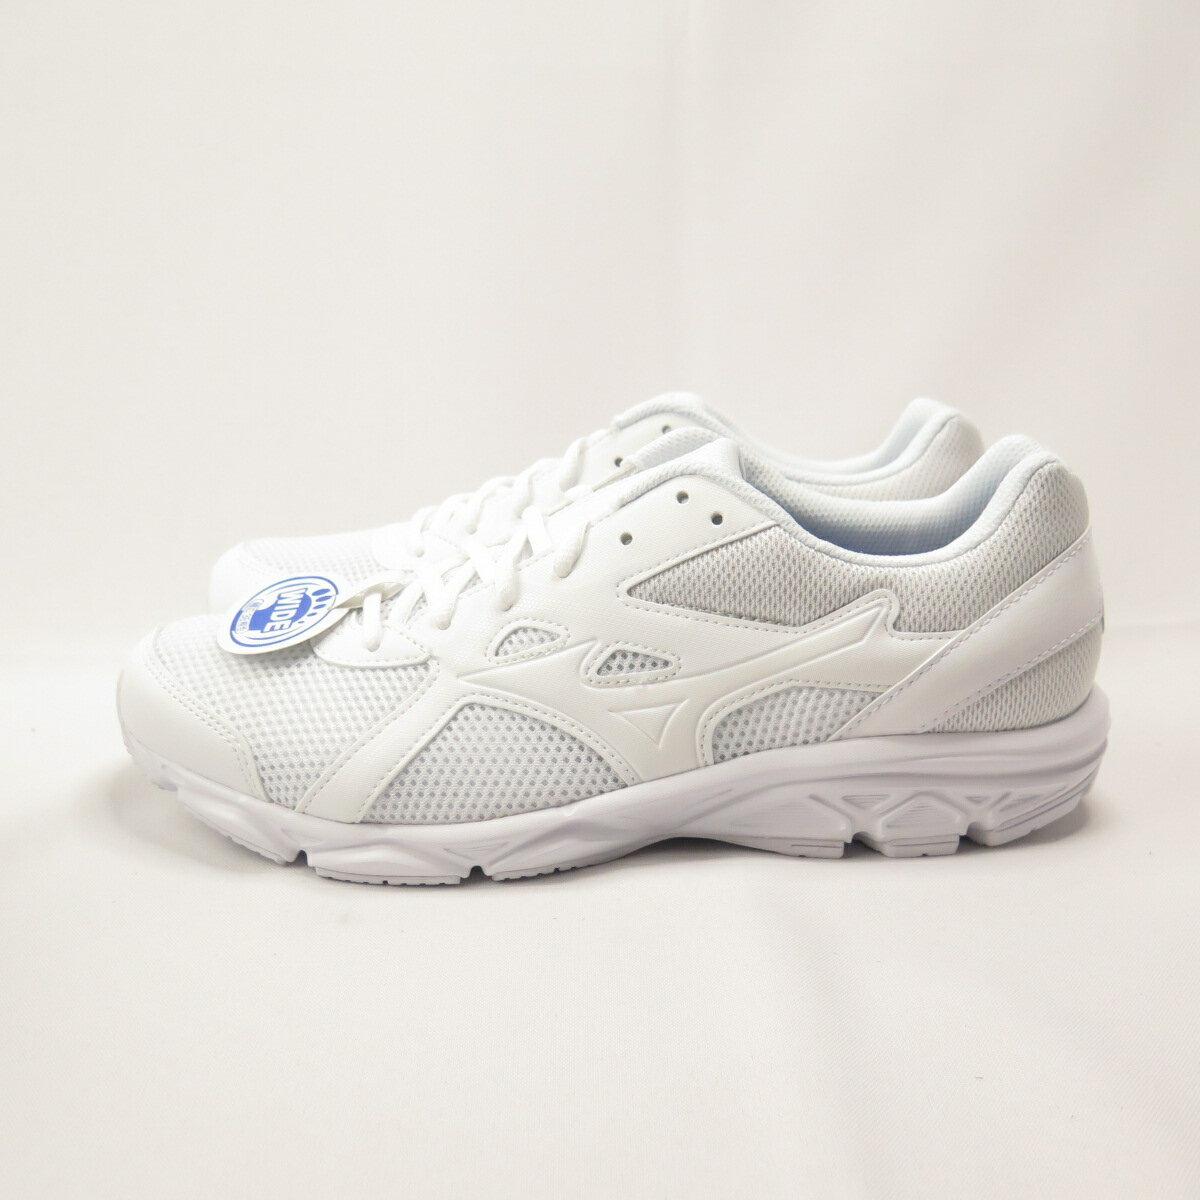 MIZUNO MAXIMIZER 22 慢跑鞋 3E寬楦 K1GA200201 男款 全白【iSport愛運動】